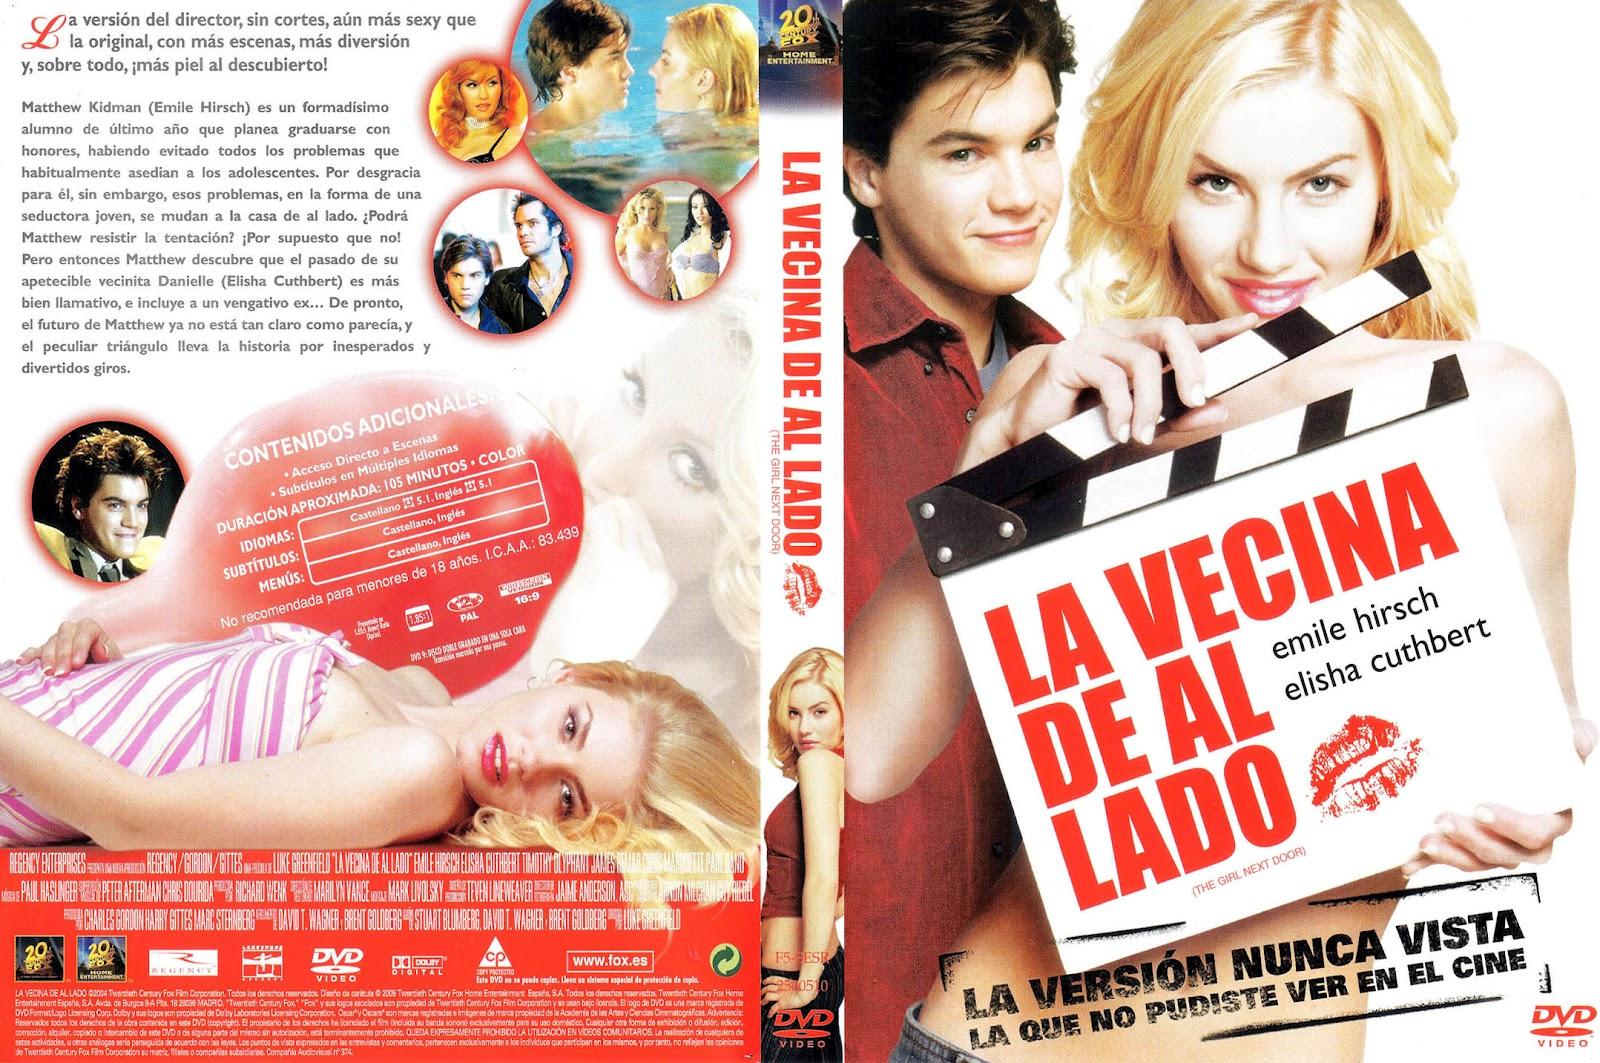 http://4.bp.blogspot.com/-M88dmgs7mPI/UGoXJaAldqI/AAAAAAAAAbE/c4HGnER7H1A/s1600/La-Vecina-De-Al-Lado-Frontal-DVD.jpg